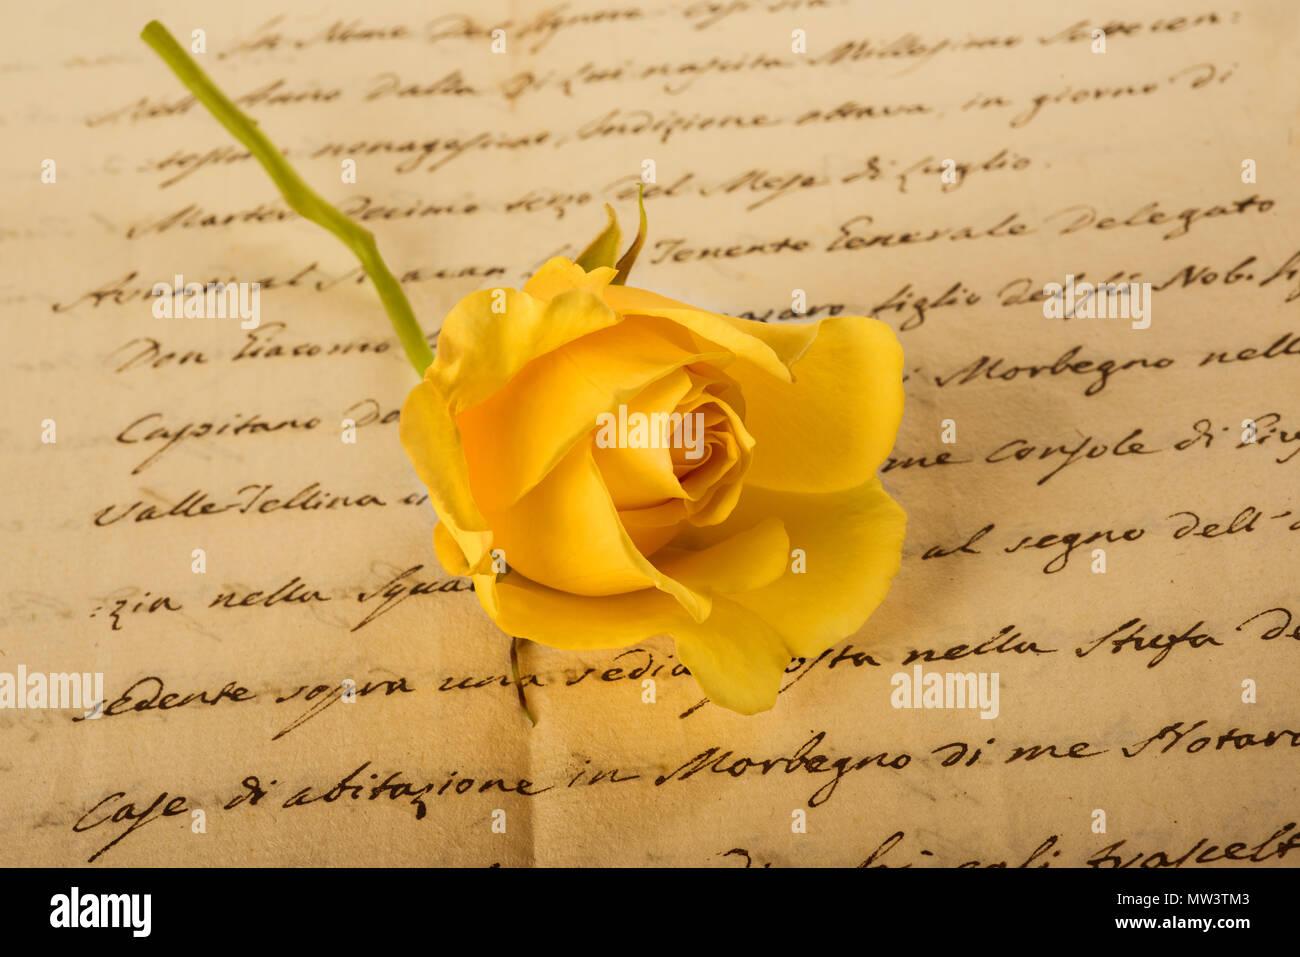 Yellow rose on old handwriting - Stock Image